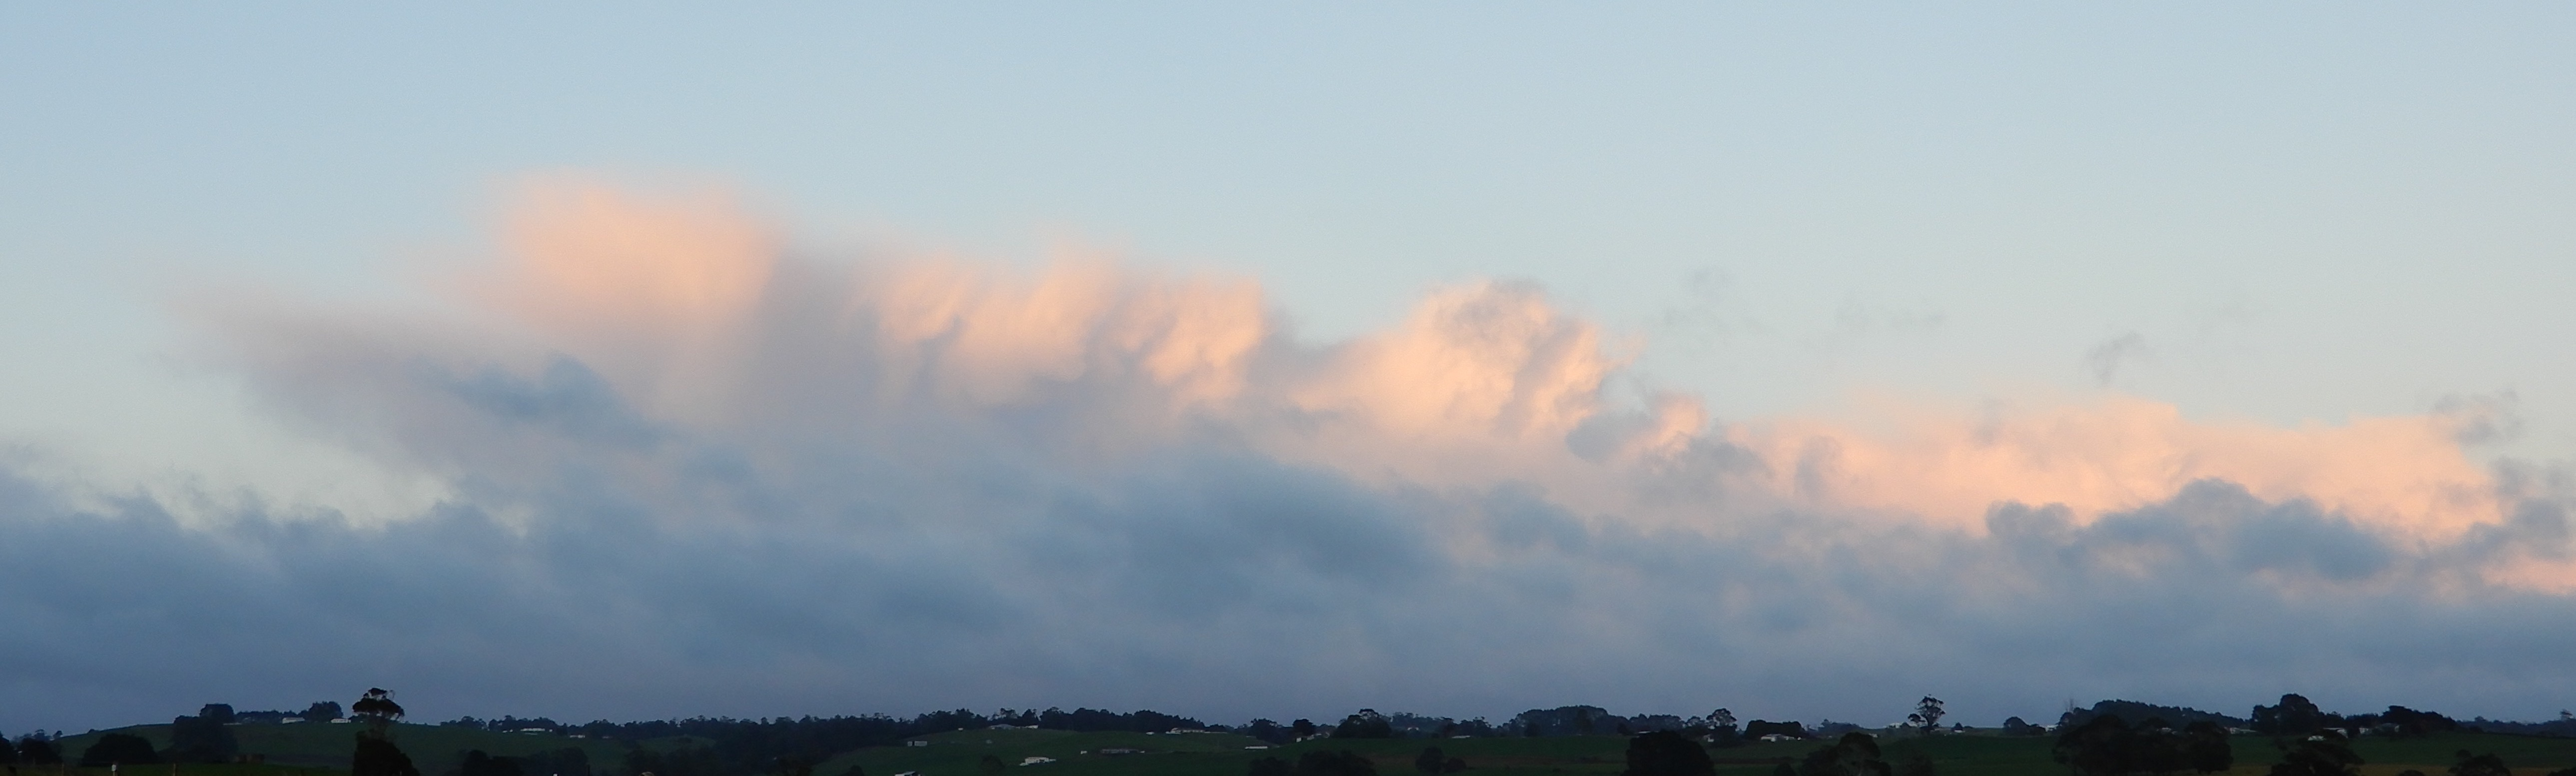 7.storm clouds